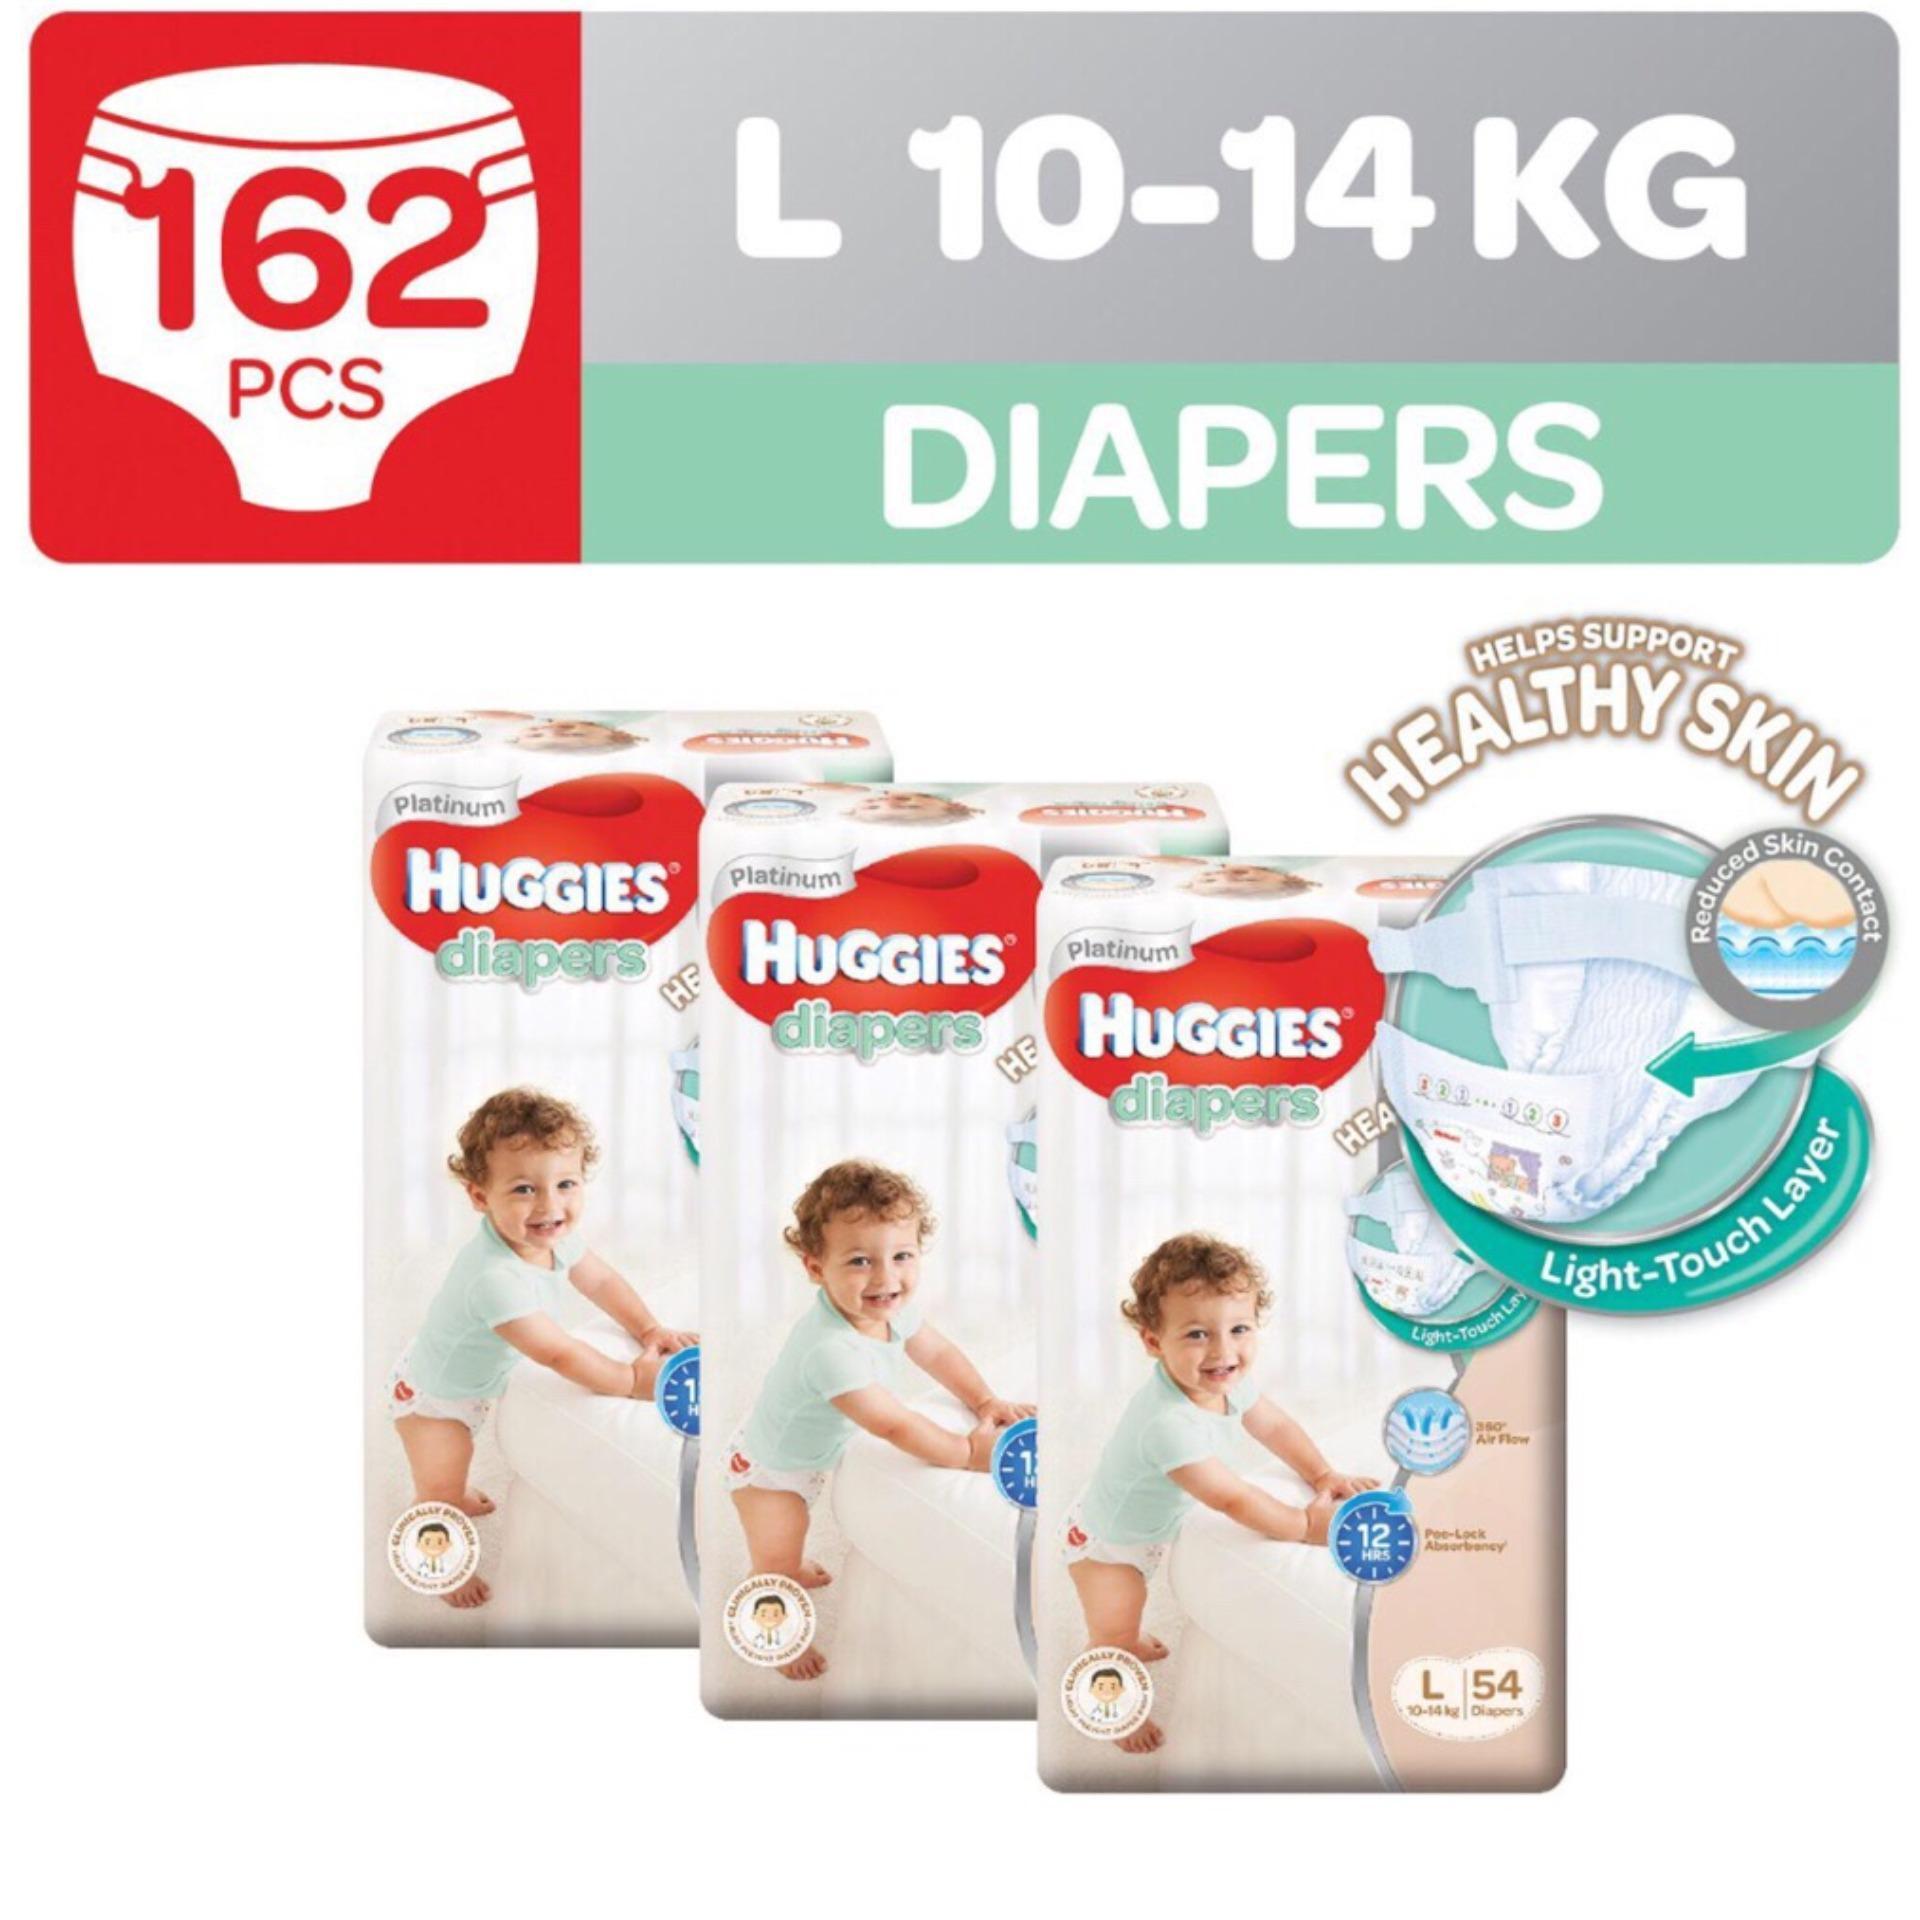 Bargain Mamypoko Pantsdisney Mickey Sakura L 44s 3 Packs Singapore Tape Small Packet Huggies Platinum Diapers Size 54 X